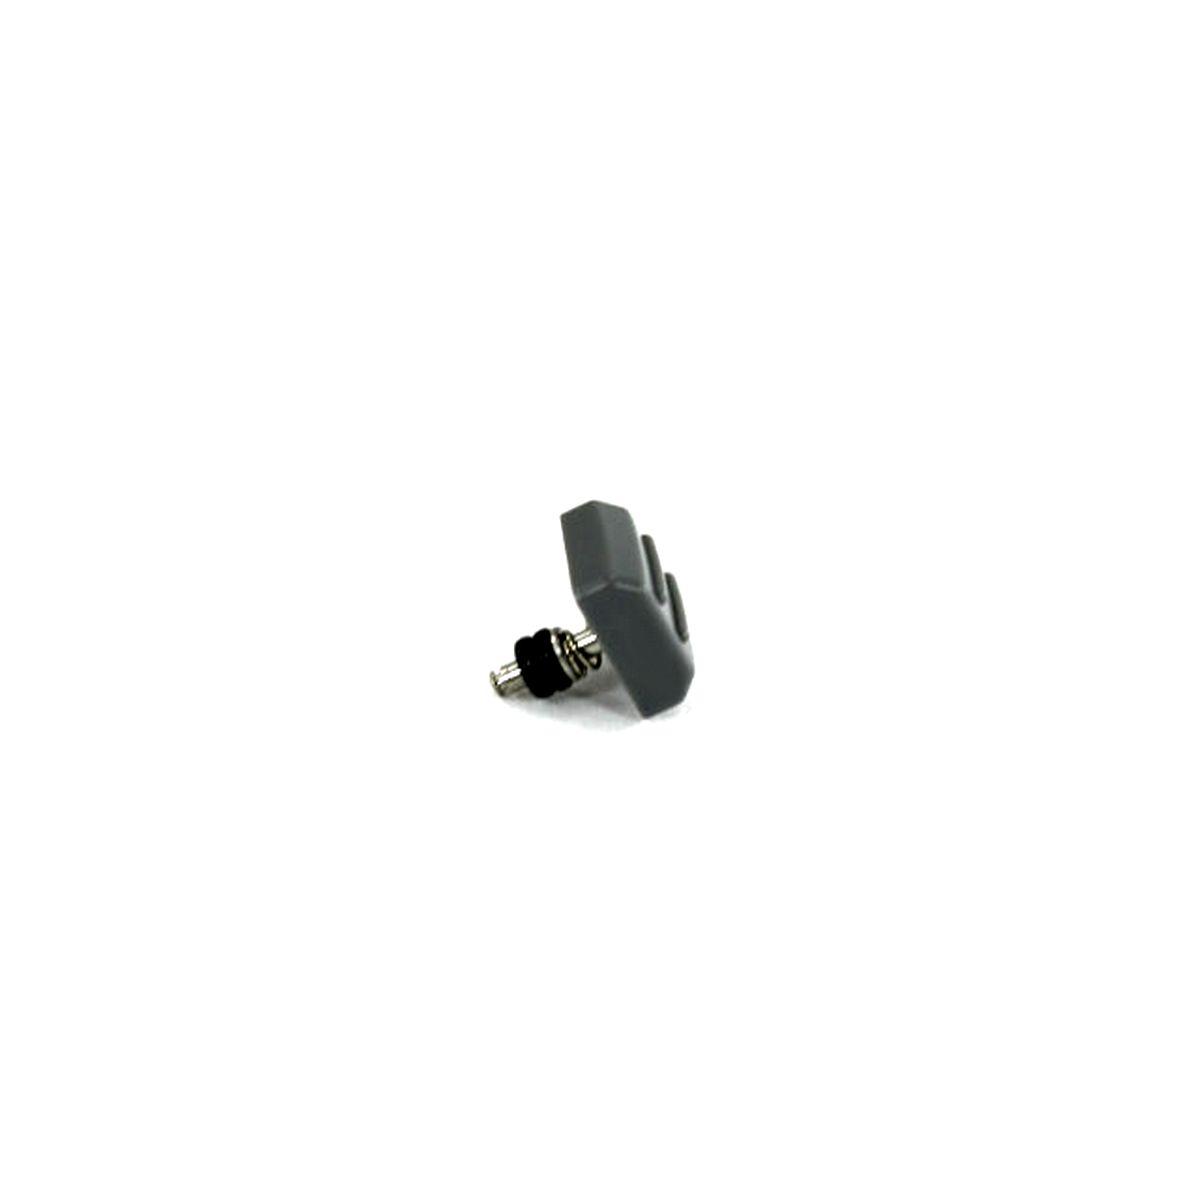 Botão Lateral  G-shock  G-7510-1VG-7500-1V Cinza Escuro      - E-Presentes